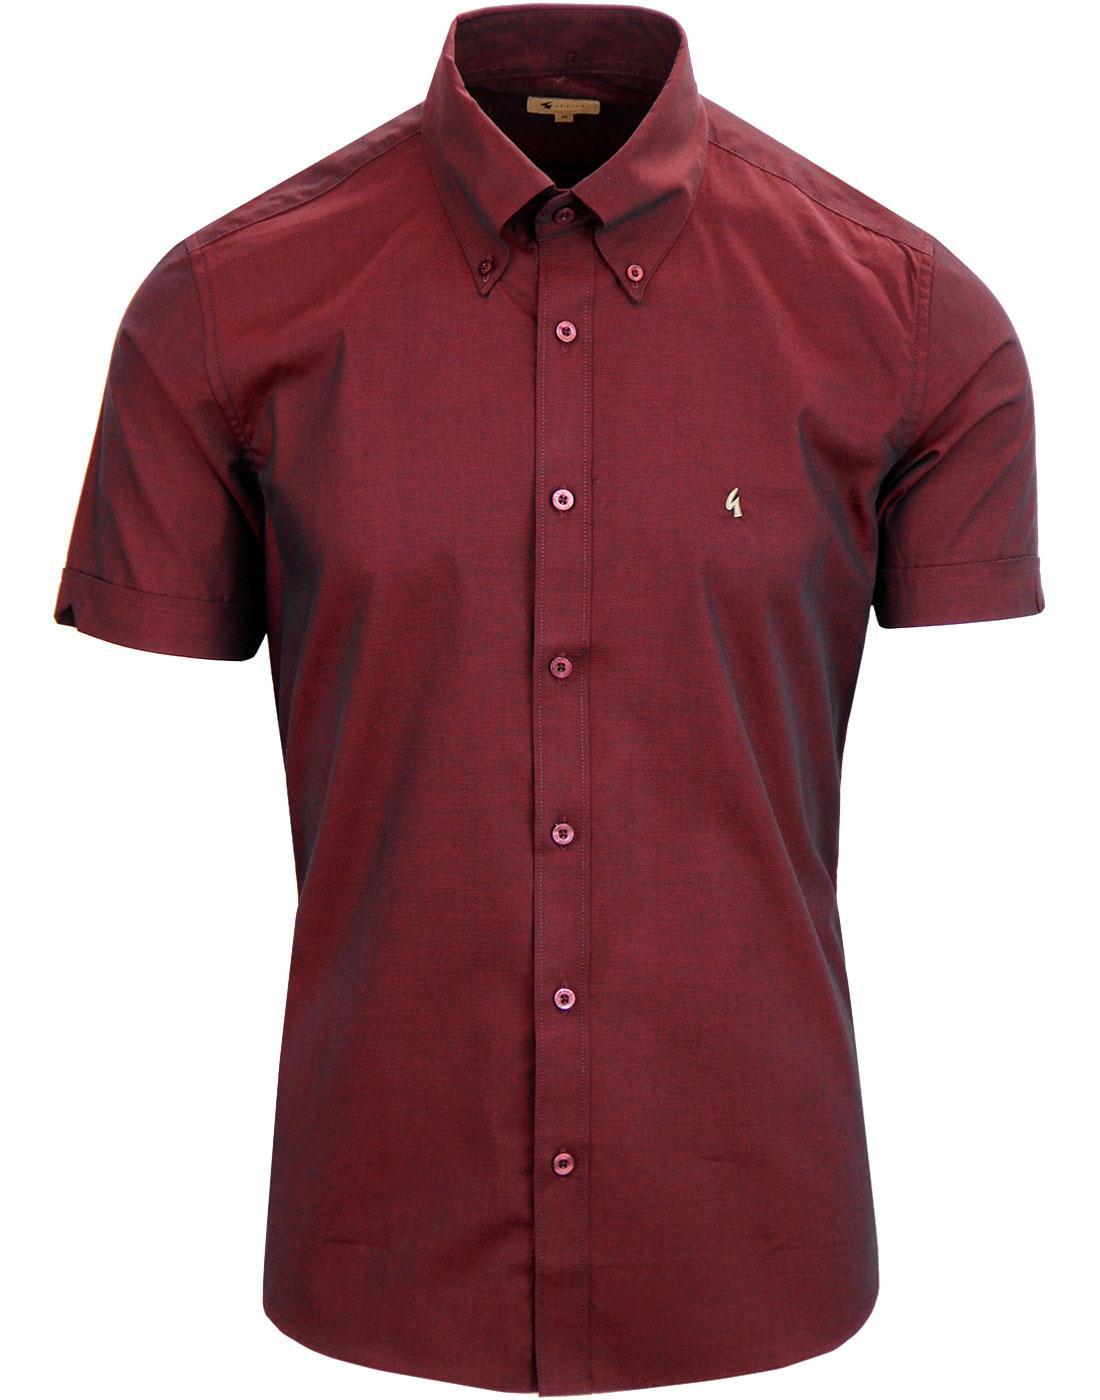 Pimlico GABICCI VINTAGE Retro Mod Tonic Shirt PORT